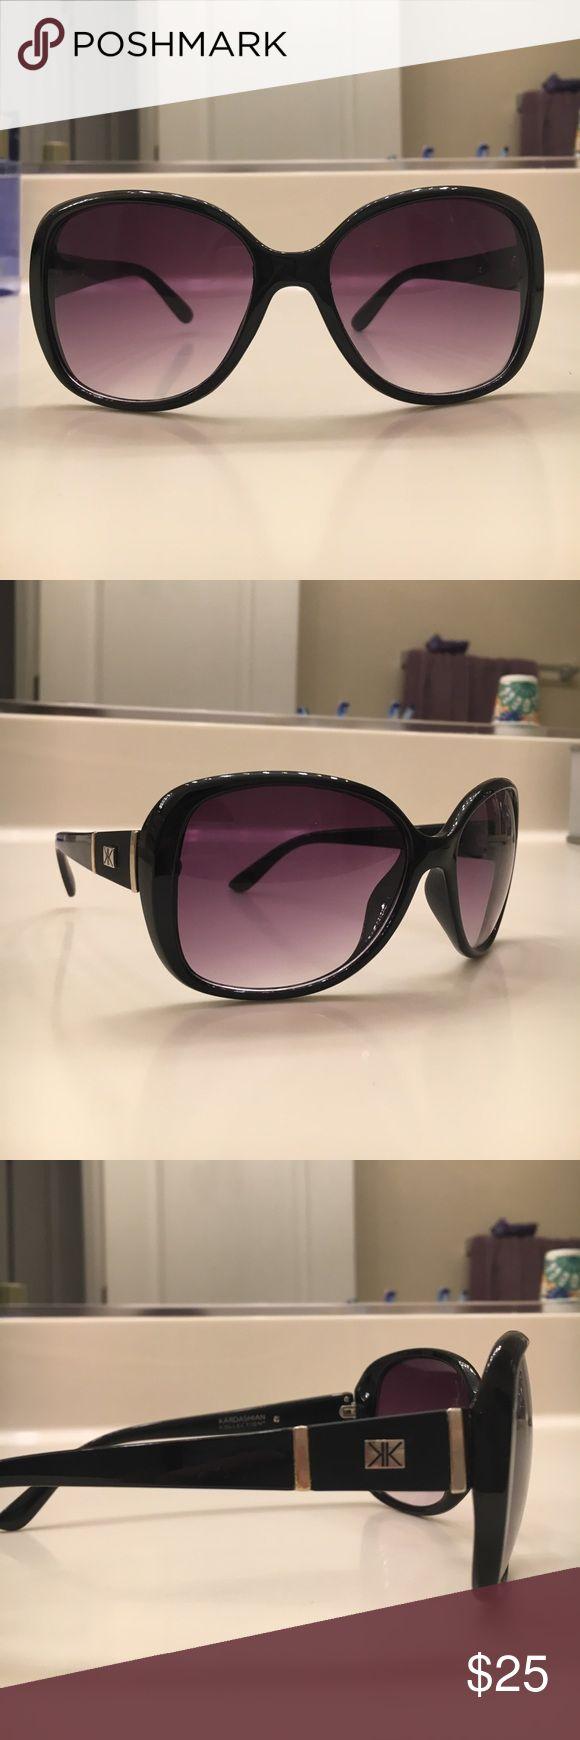 Kardashian Kollection Sunglasses Very lightly worn Kardashian Kollection Bug Eye sunglasses Kardashian Kollection Accessories Glasses